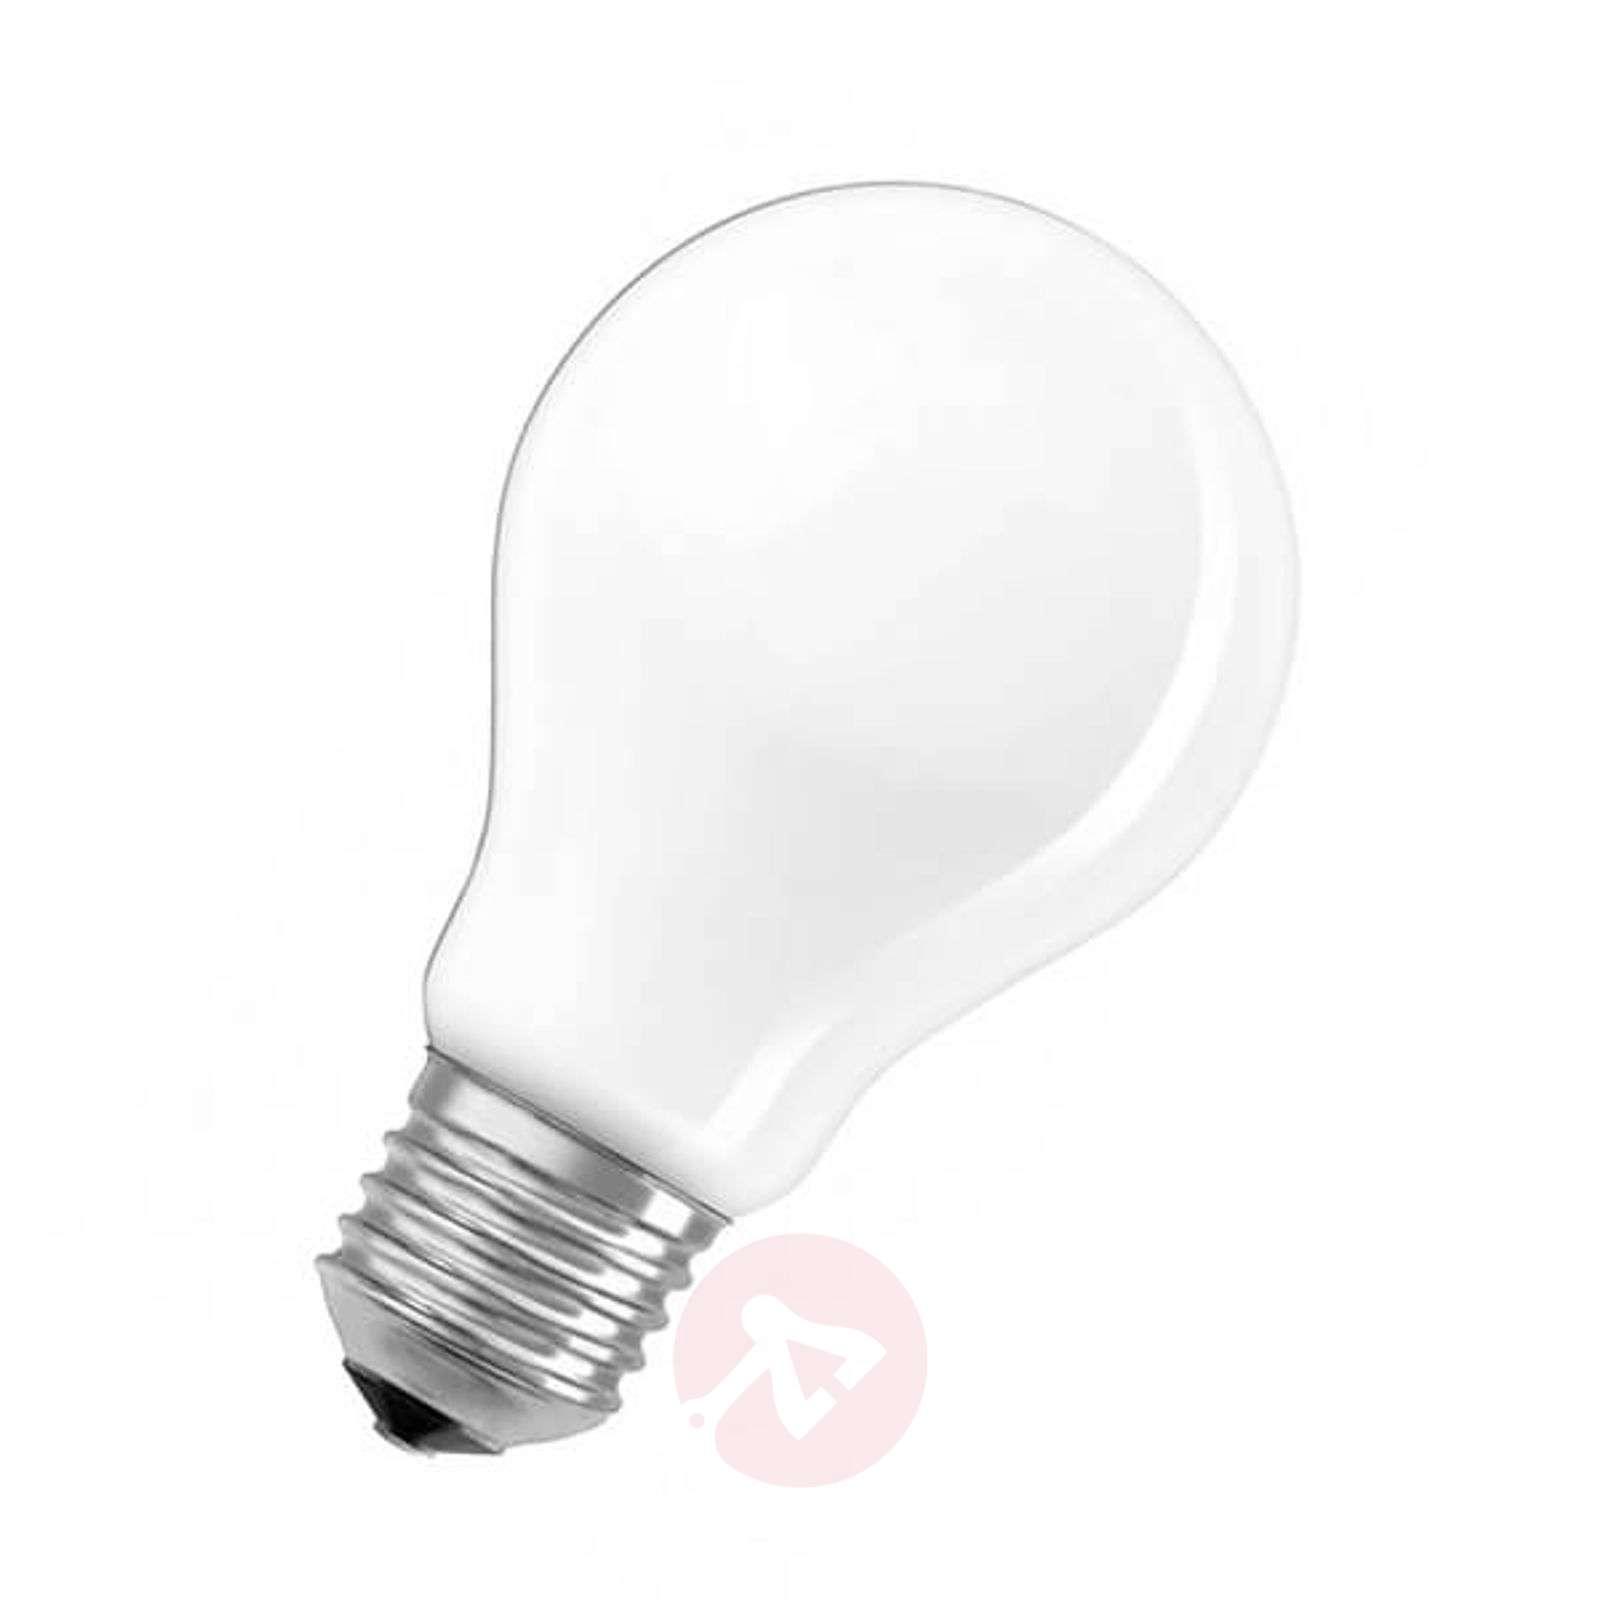 LED-lamppu E27 7 W, 806 lumenia, 3 kpl:n setti-7262101-01